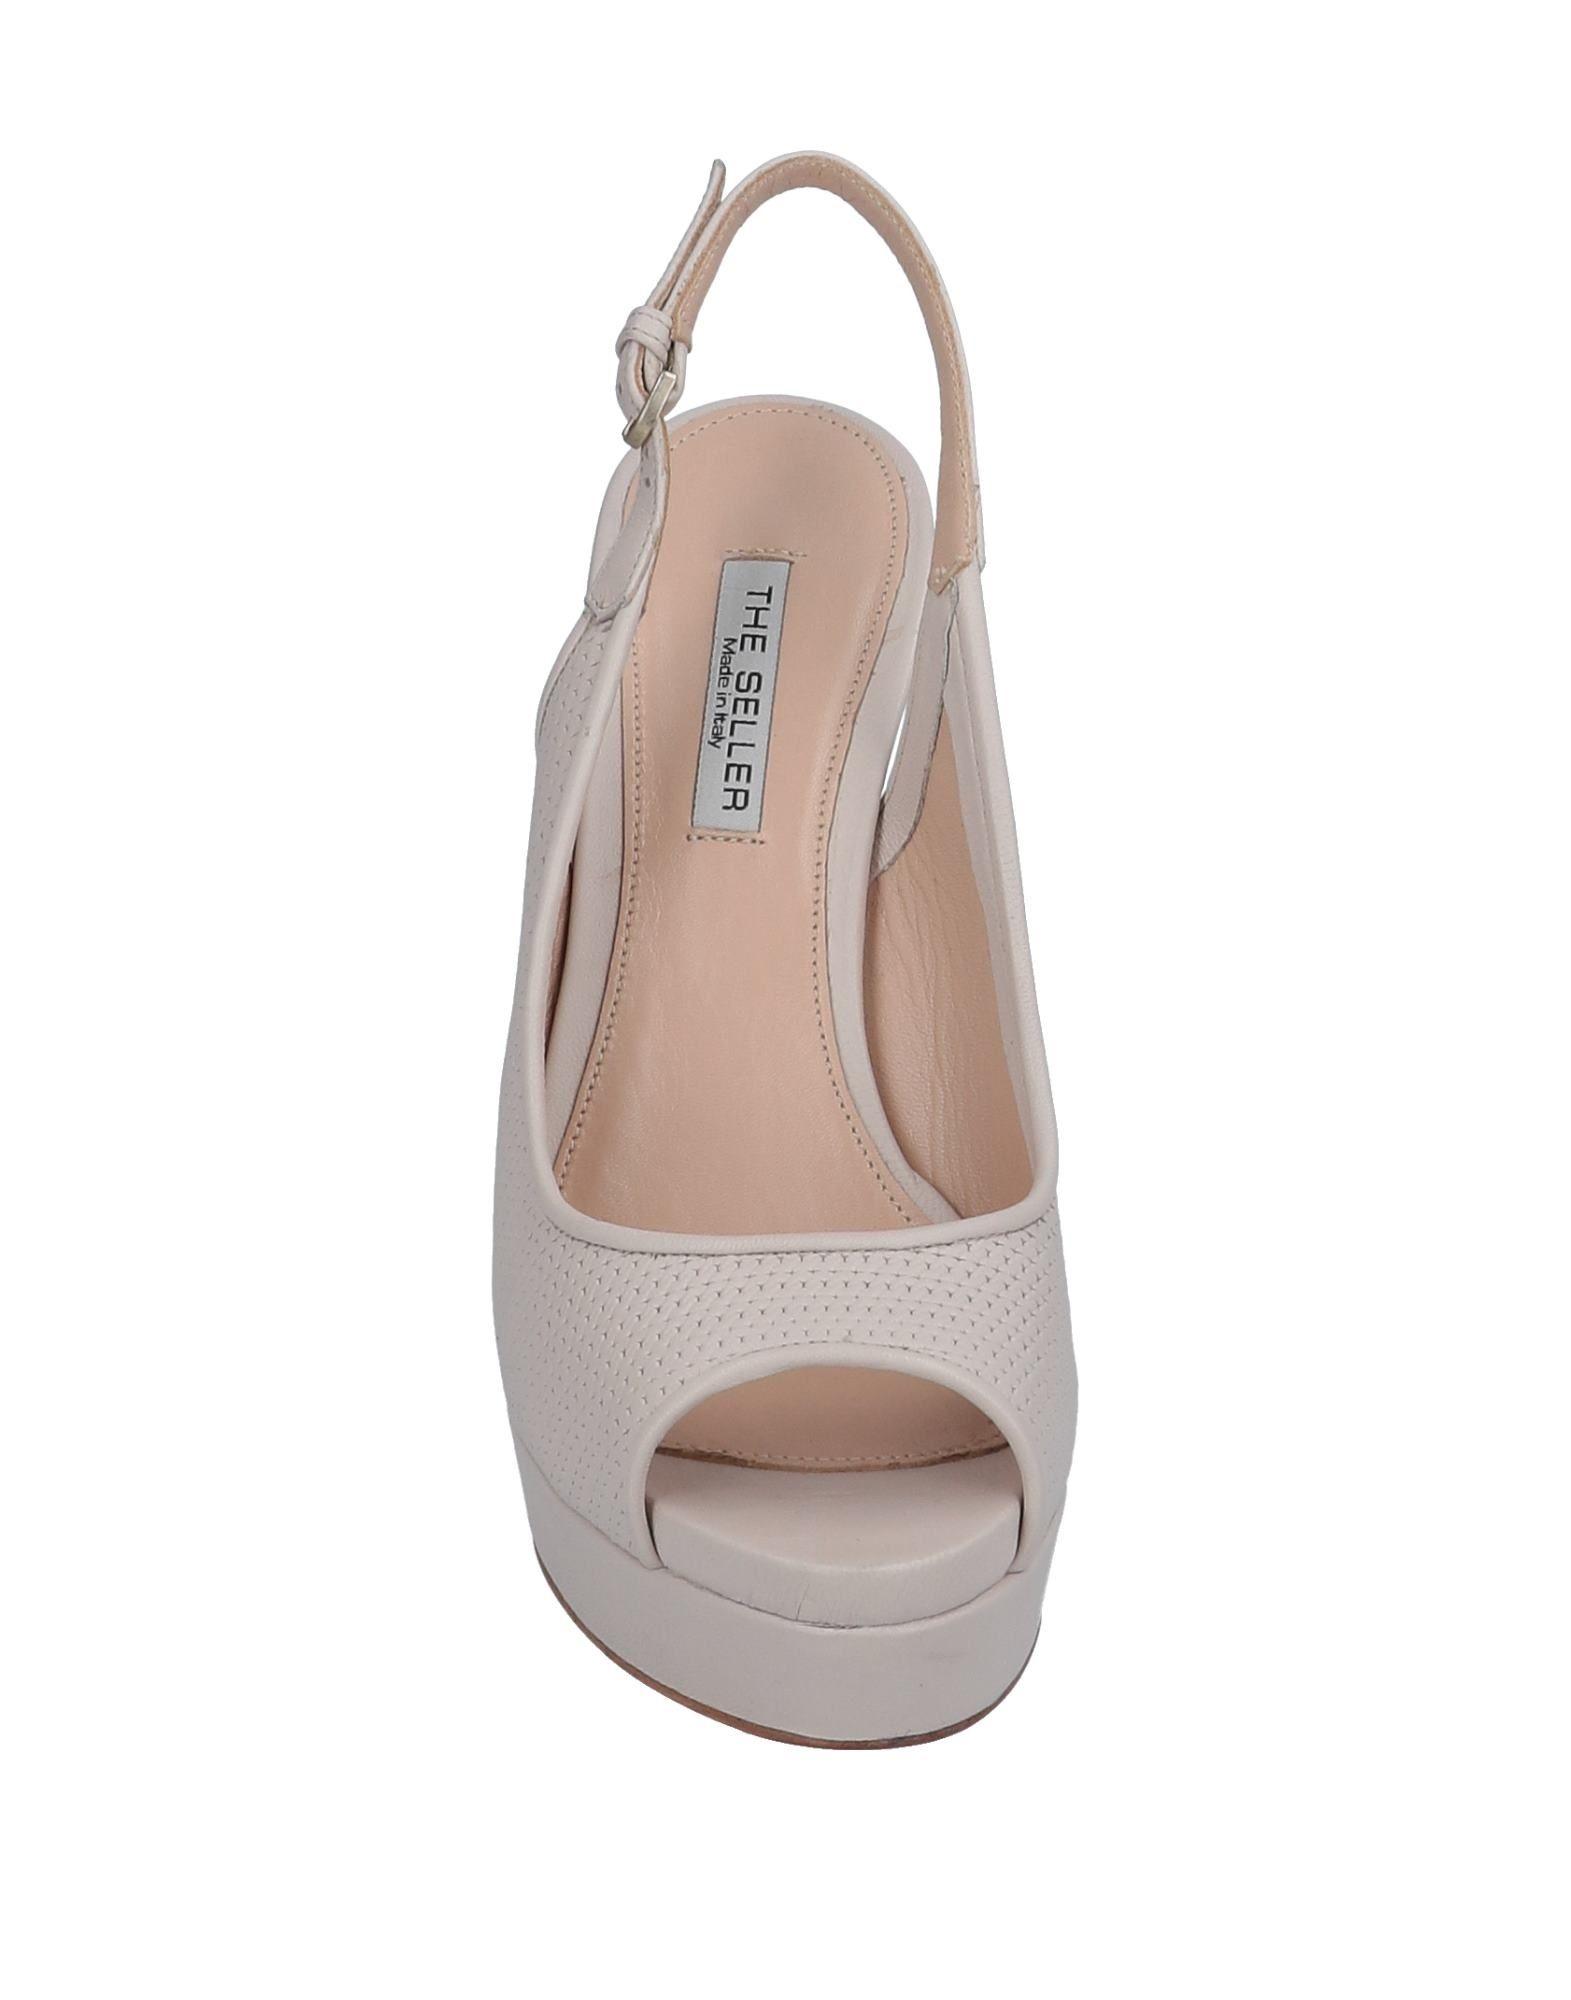 Stilvolle Seller billige Schuhe The Seller Stilvolle Sandalen Damen  11560671BD c83b3a